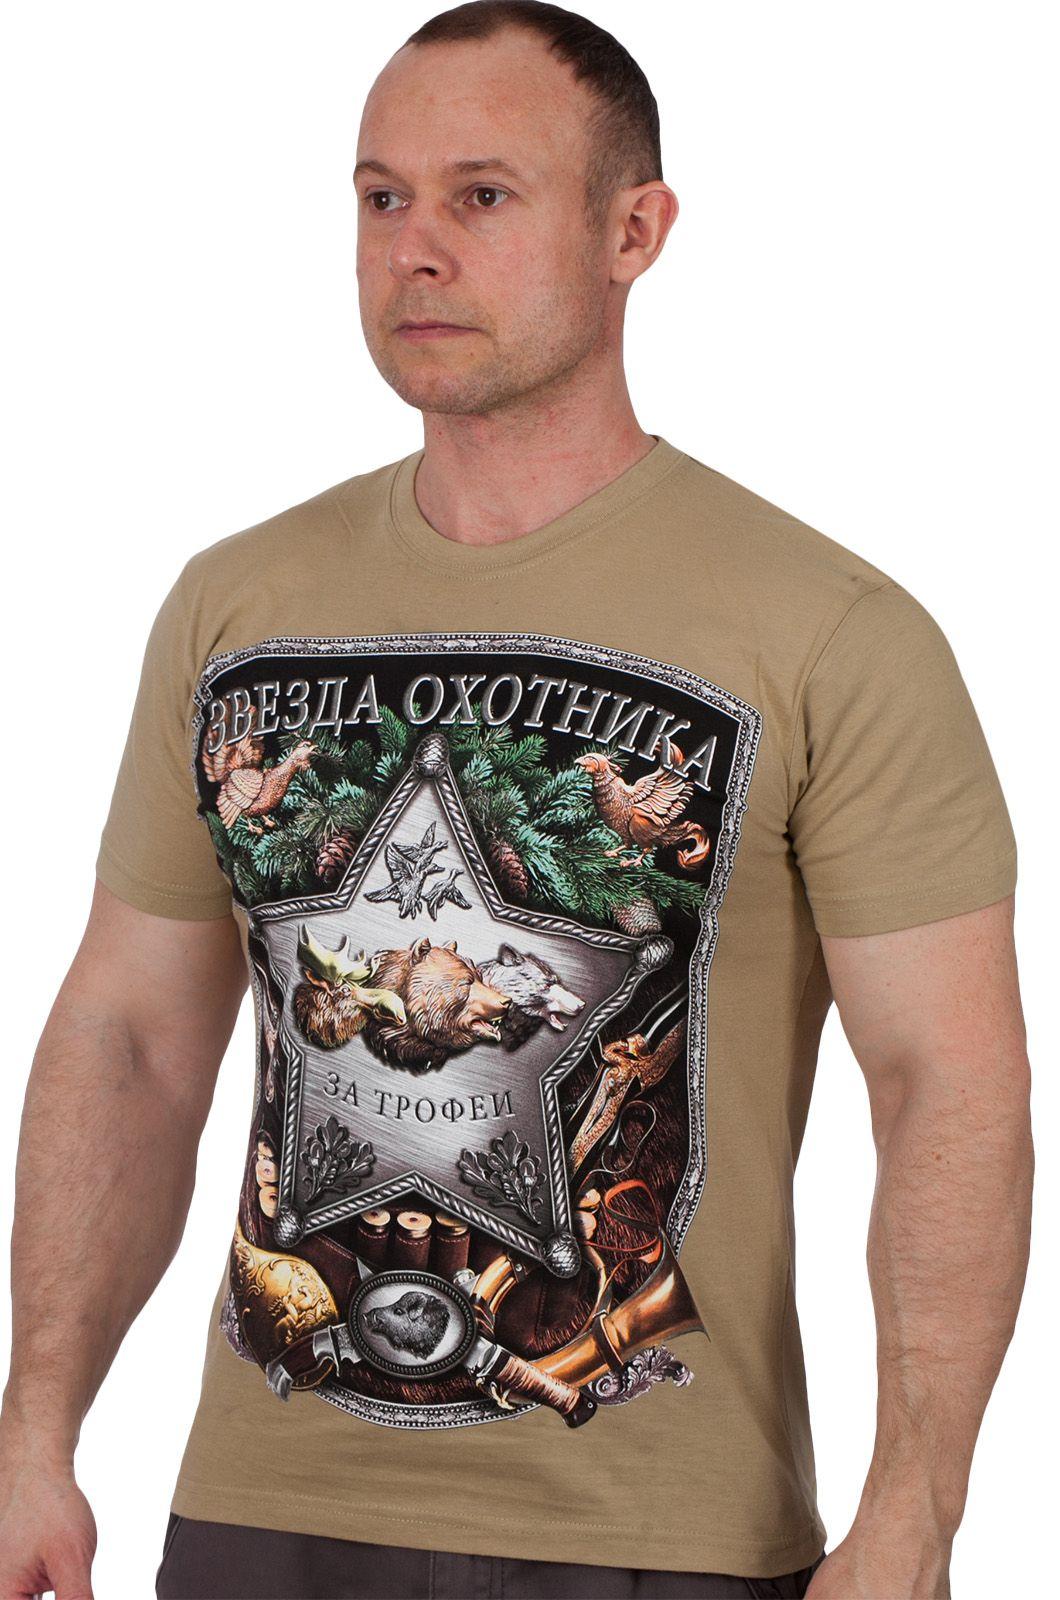 Крутая милитари футболка на подарок мужчине-охотнику